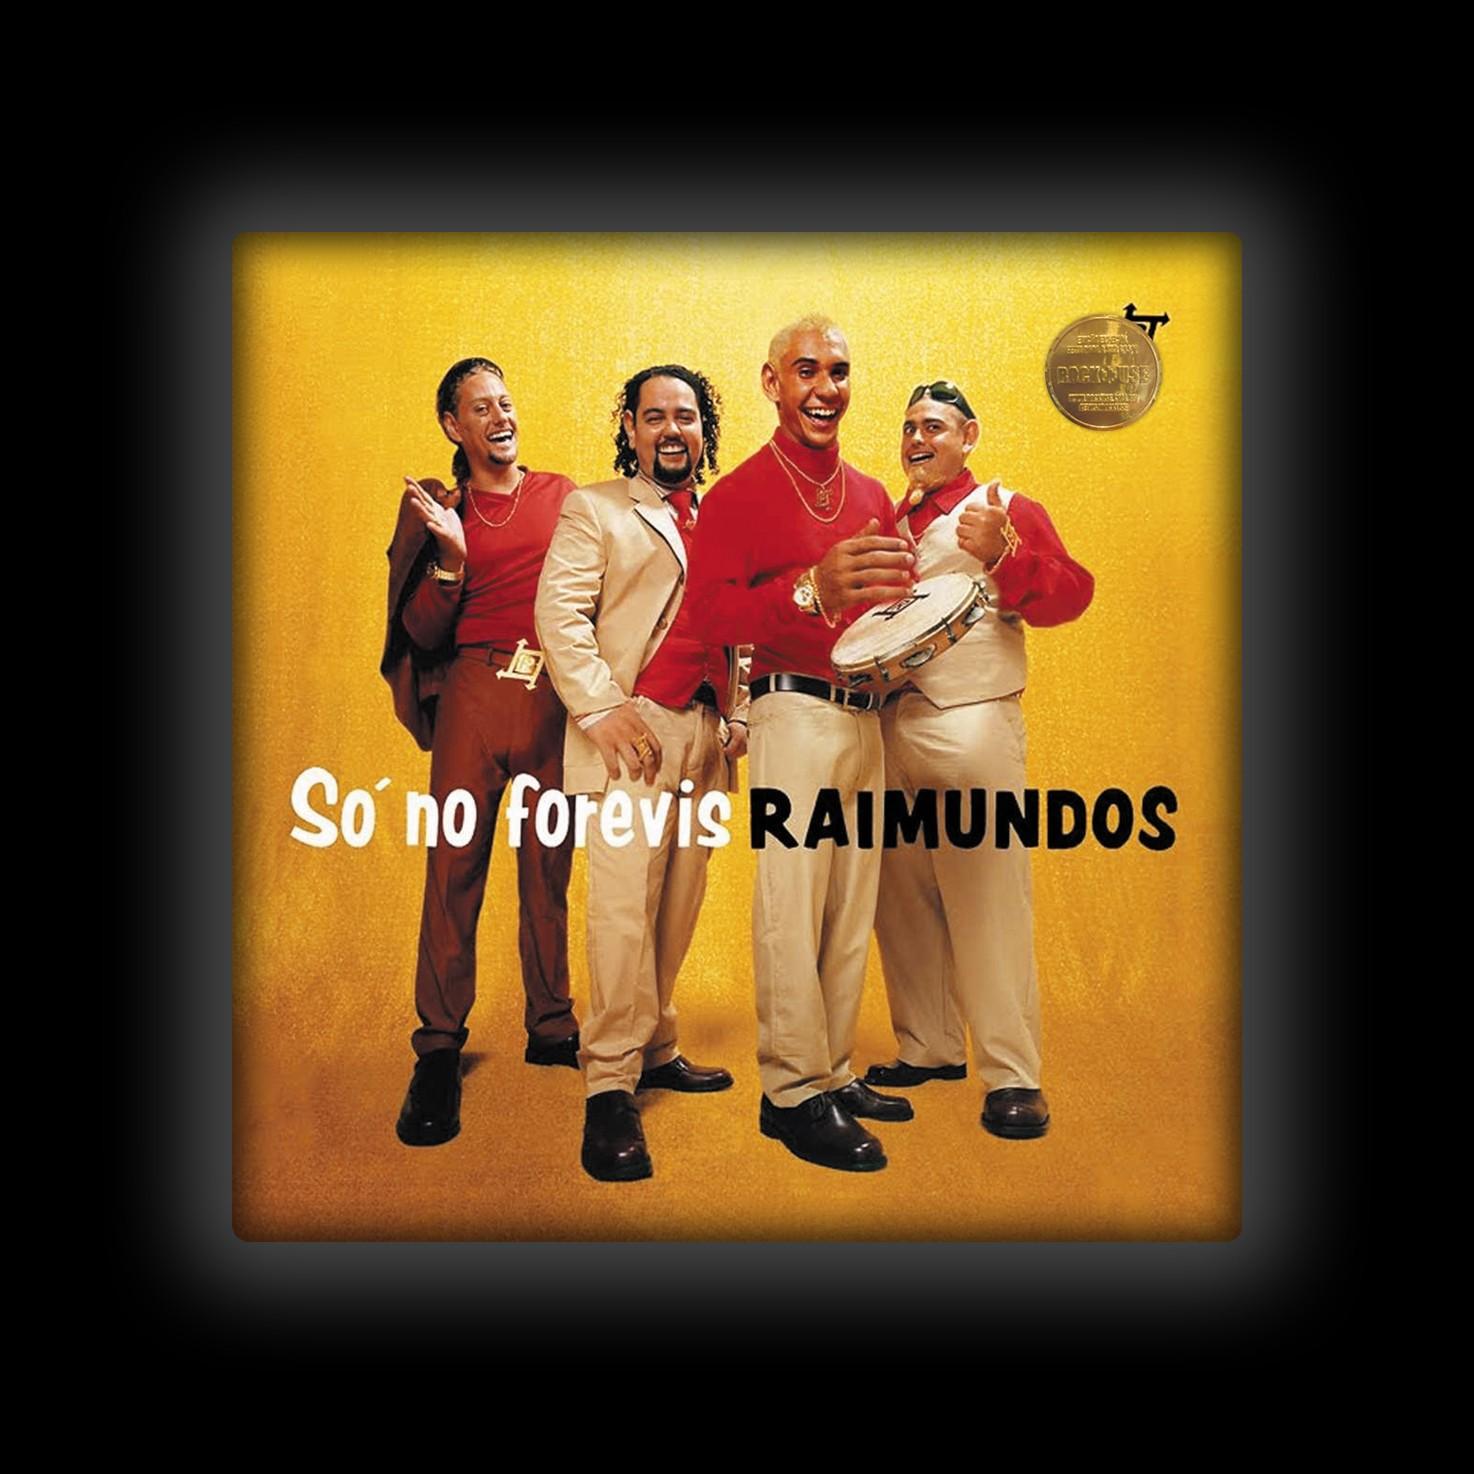 Capa de Almofada Raimundos - Só No Forévis